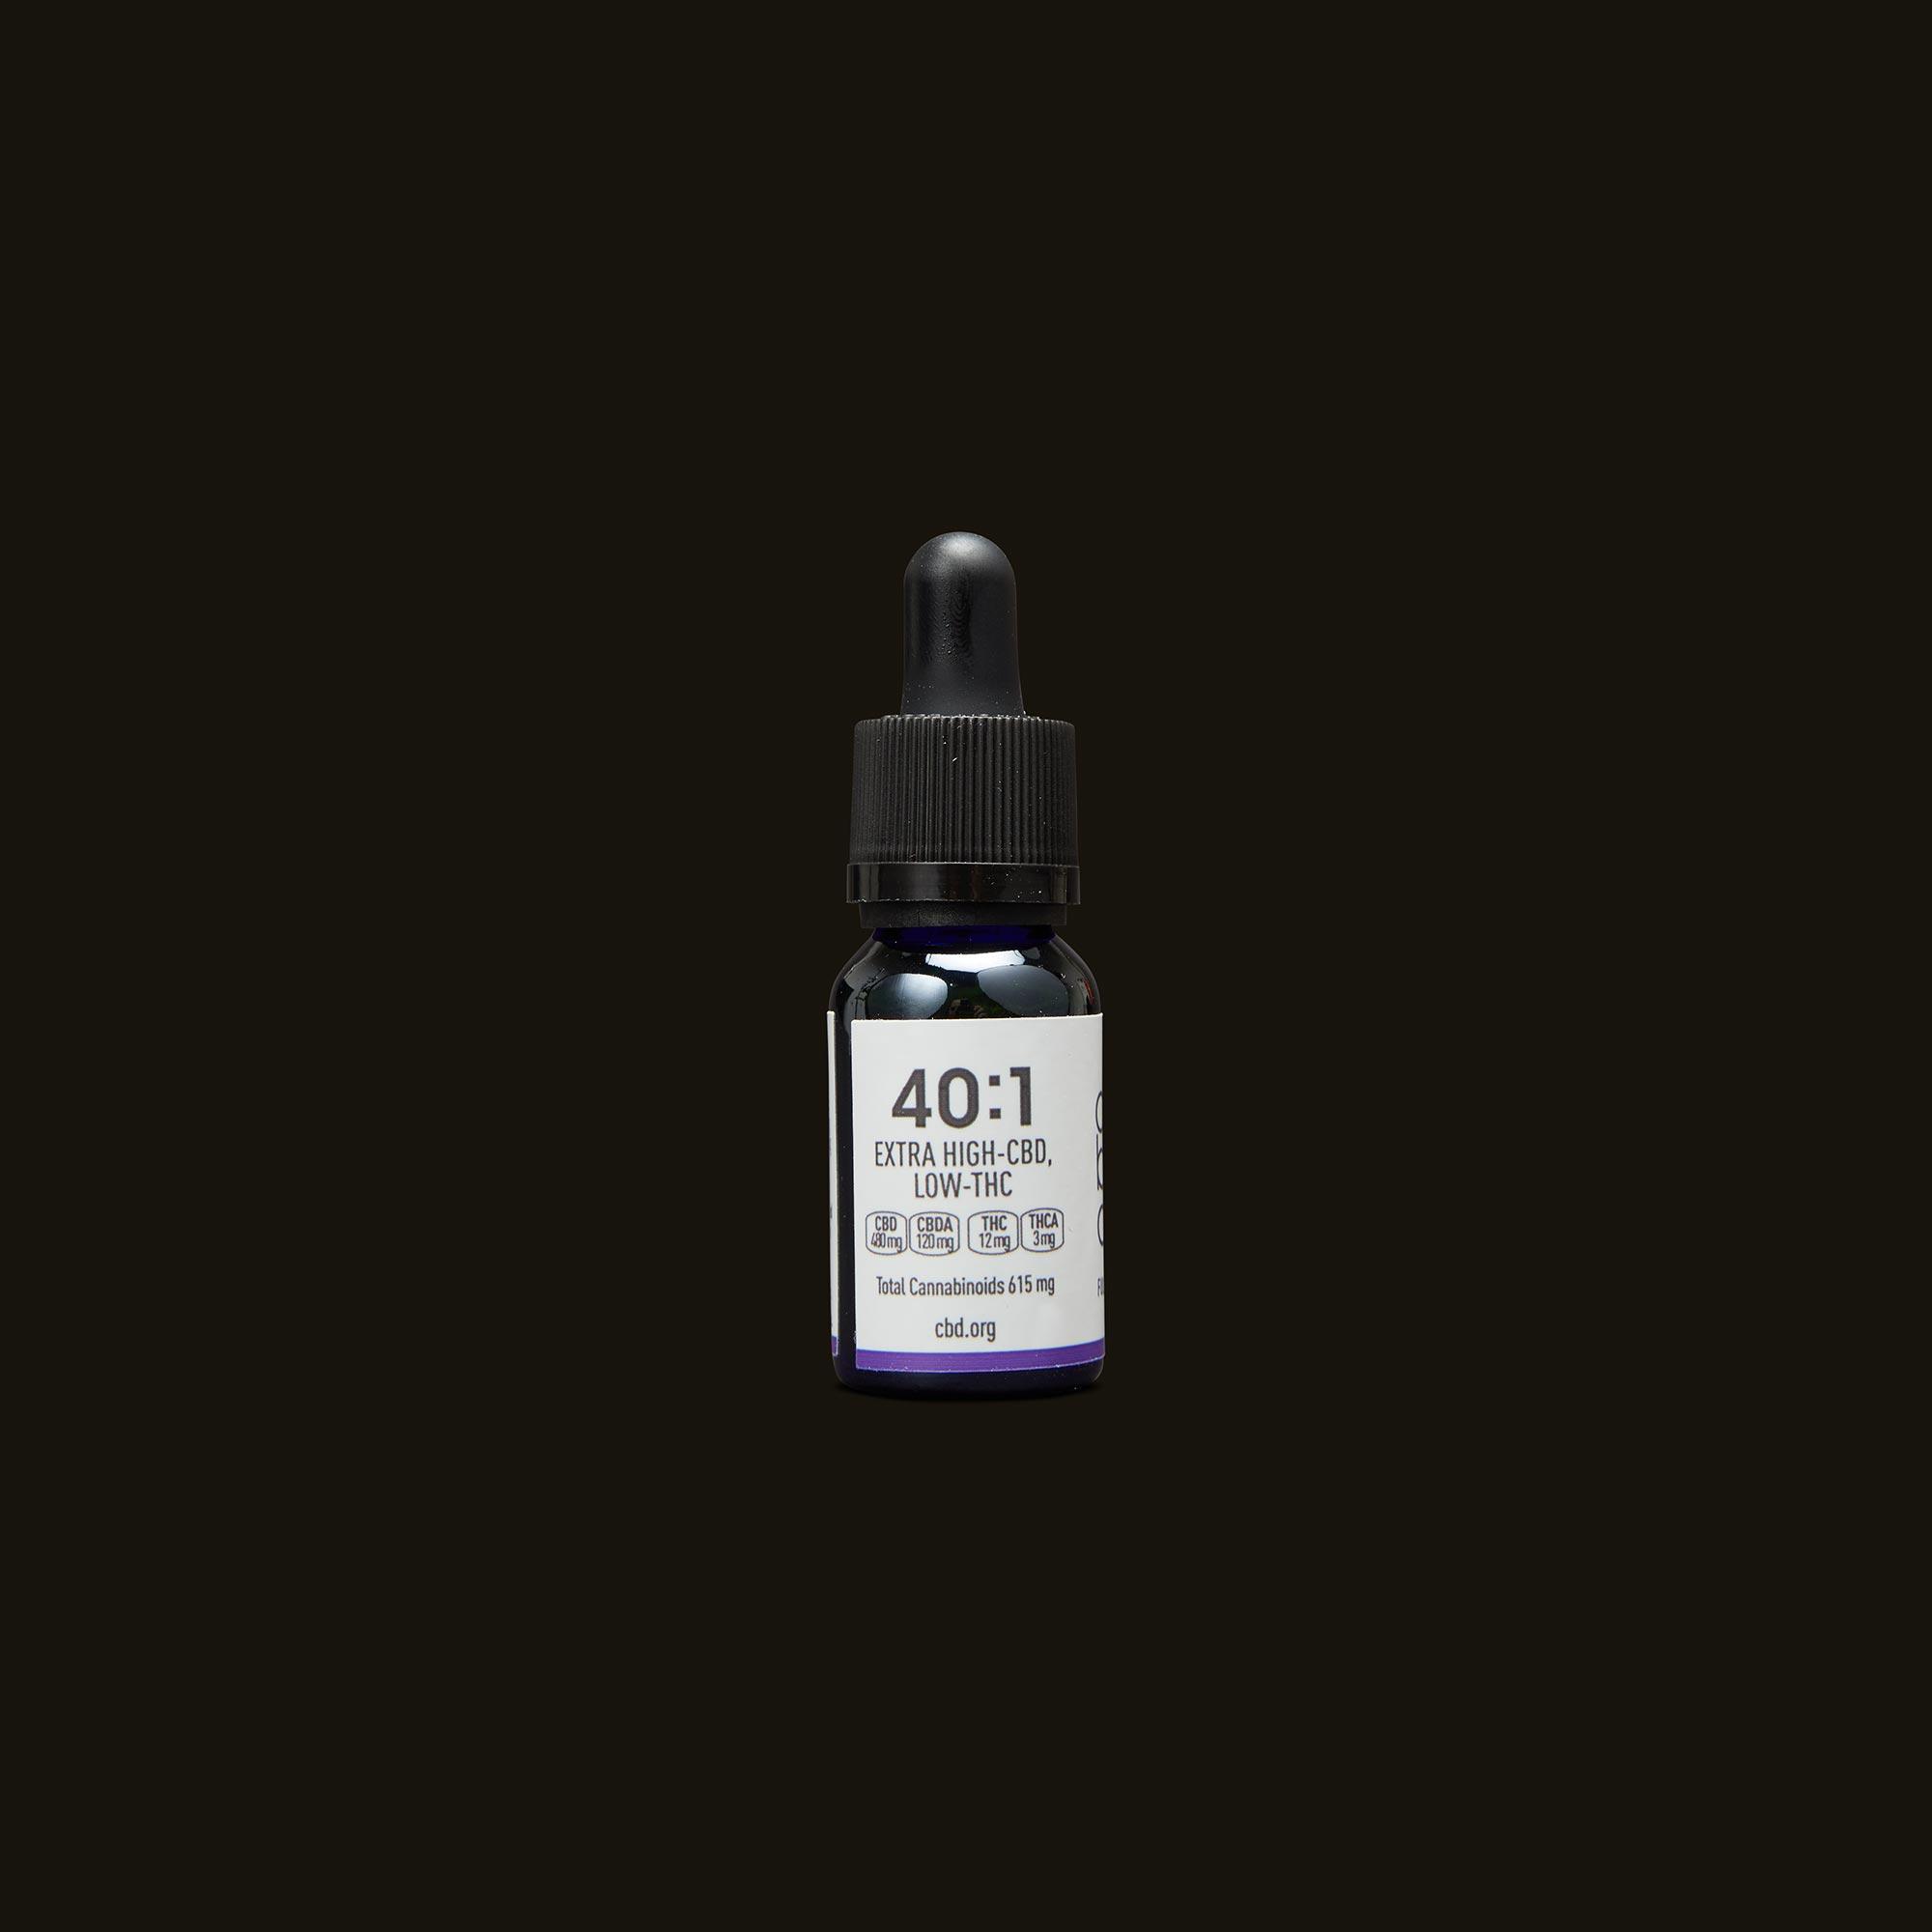 Care By Design 40:1 Full Spectrum CBD Drops - 0.5oz Back Tincture